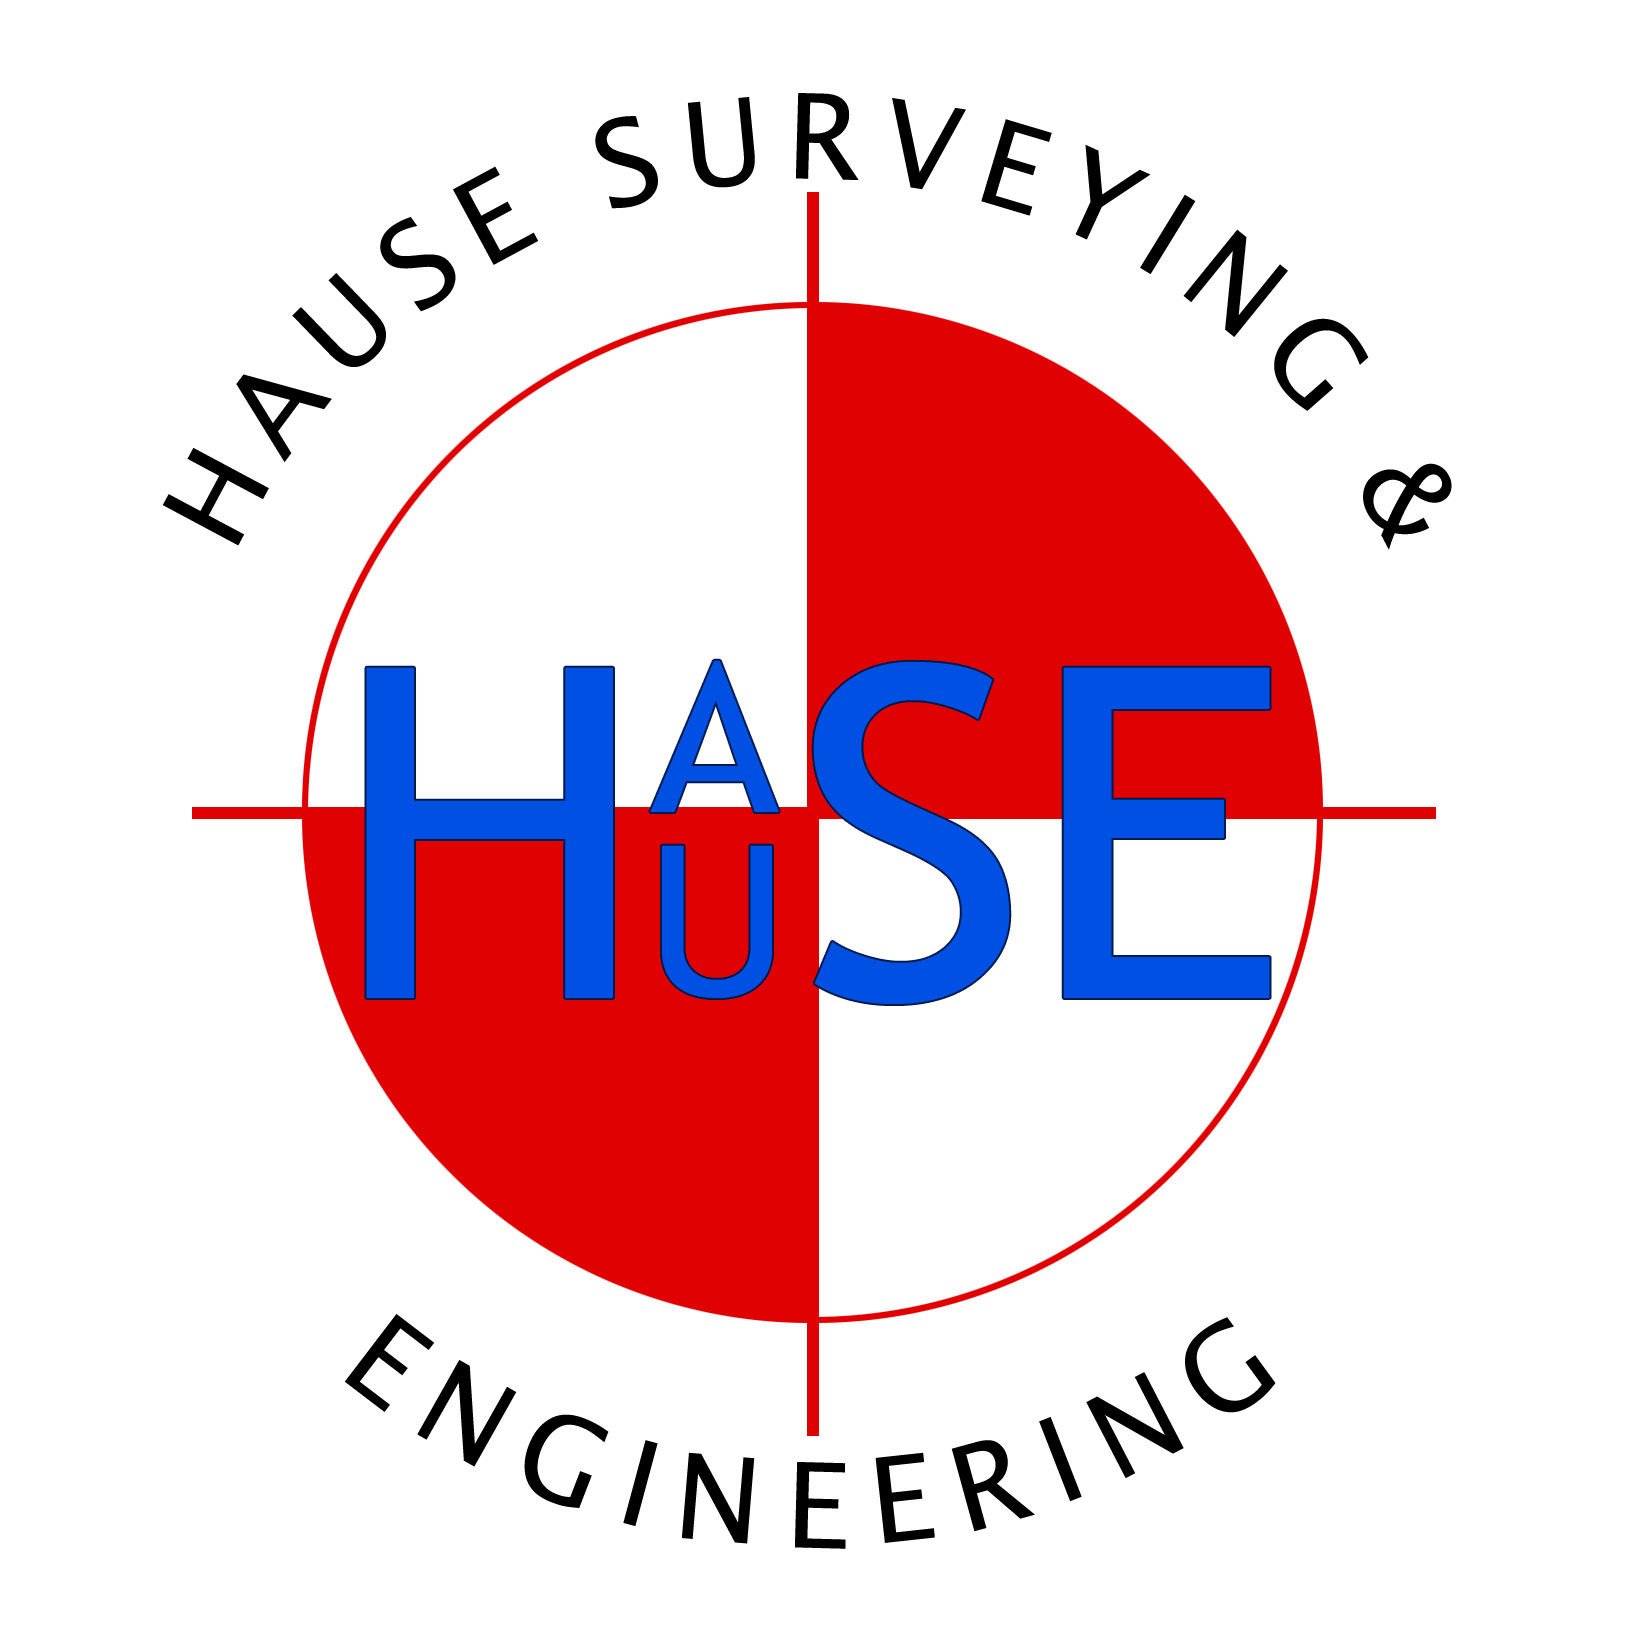 HSE_logo_large.jpg